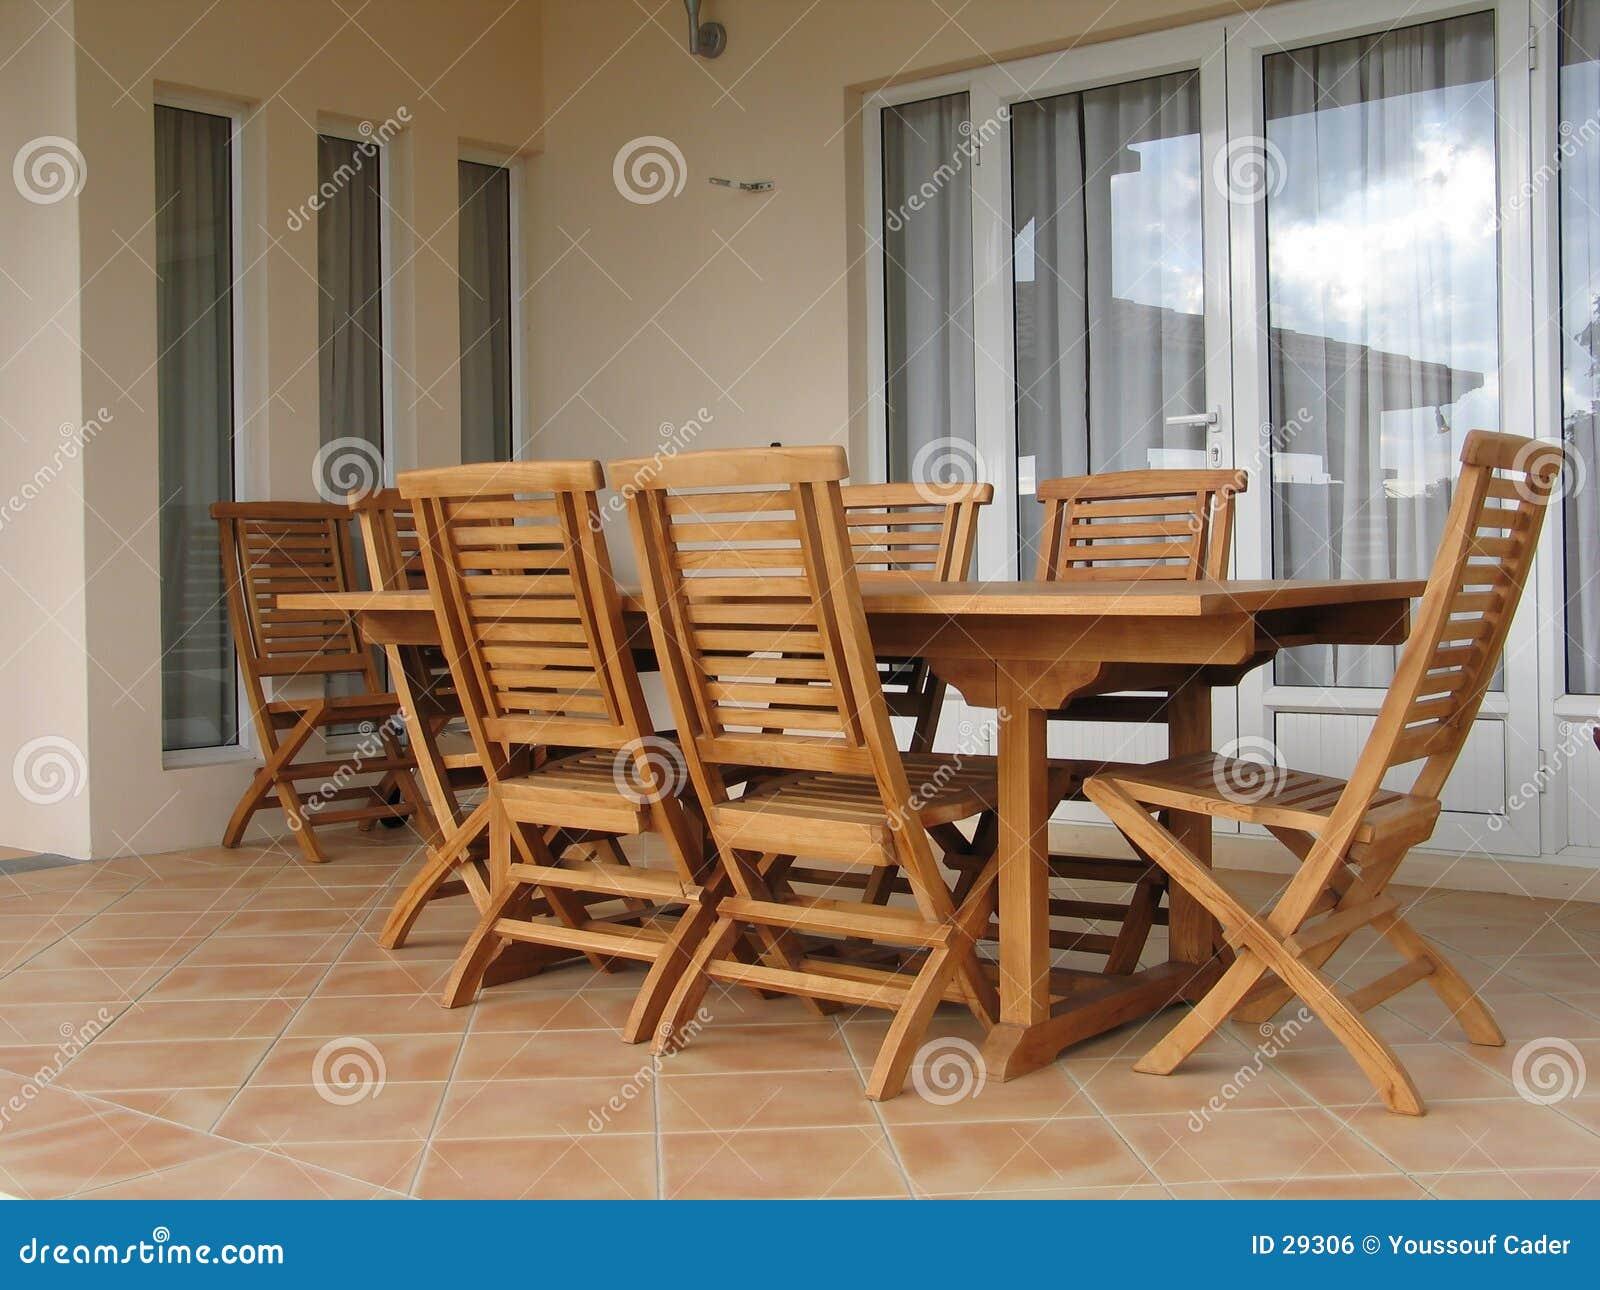 Wooden set 1